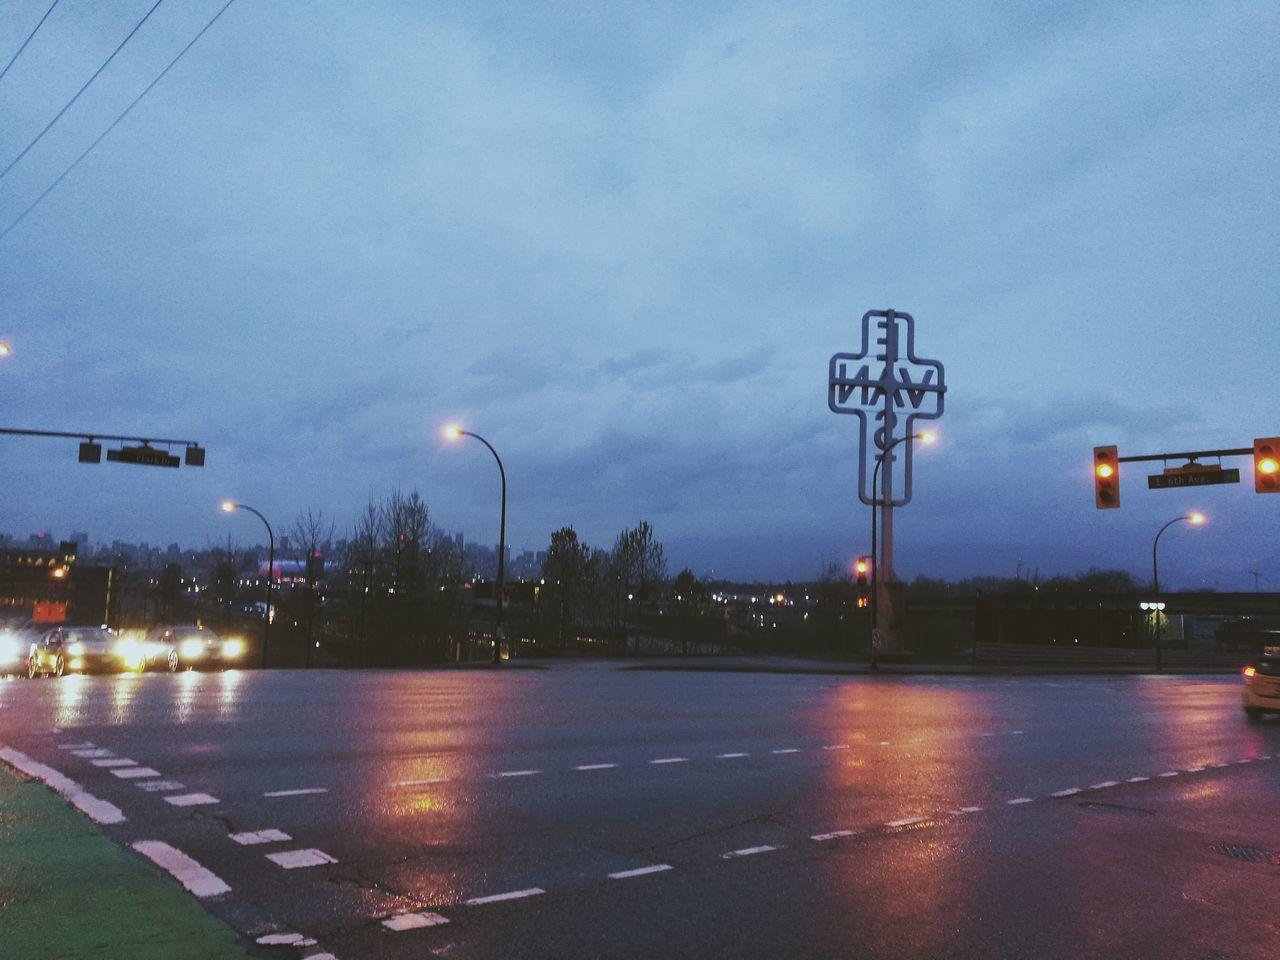 street light, illuminated, road, transportation, sky, no people, outdoors, tree, night, city